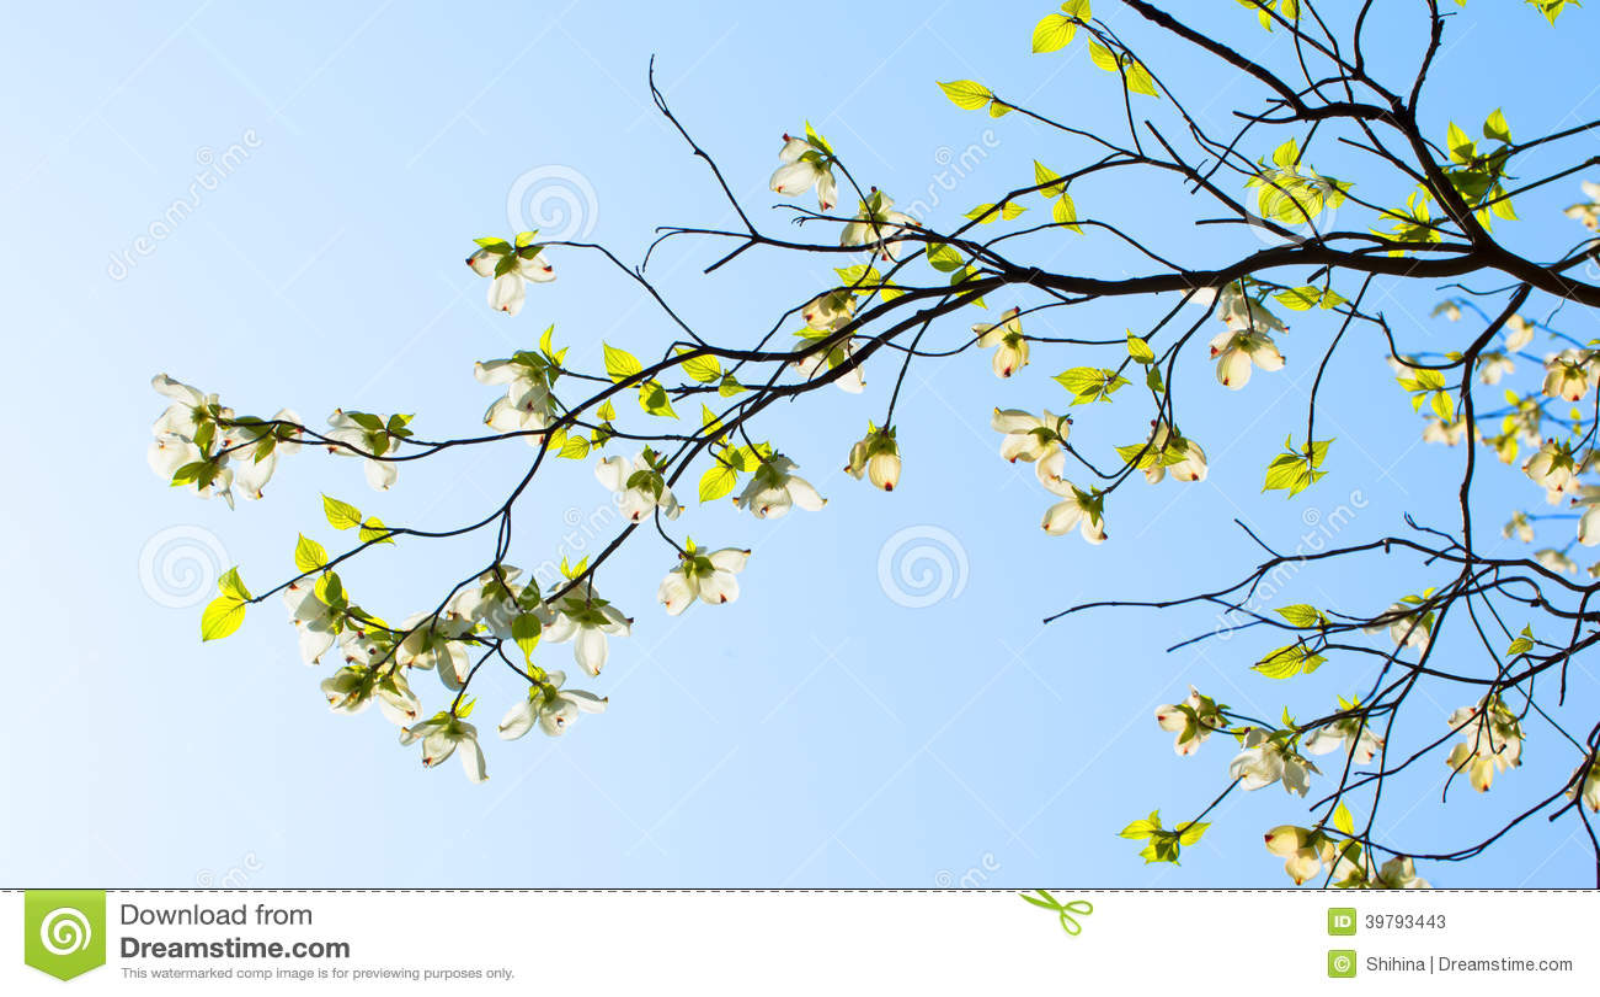 Branches Of Dogwood (Cornus Florida) And Blue Sky Stock Photo - Image ...